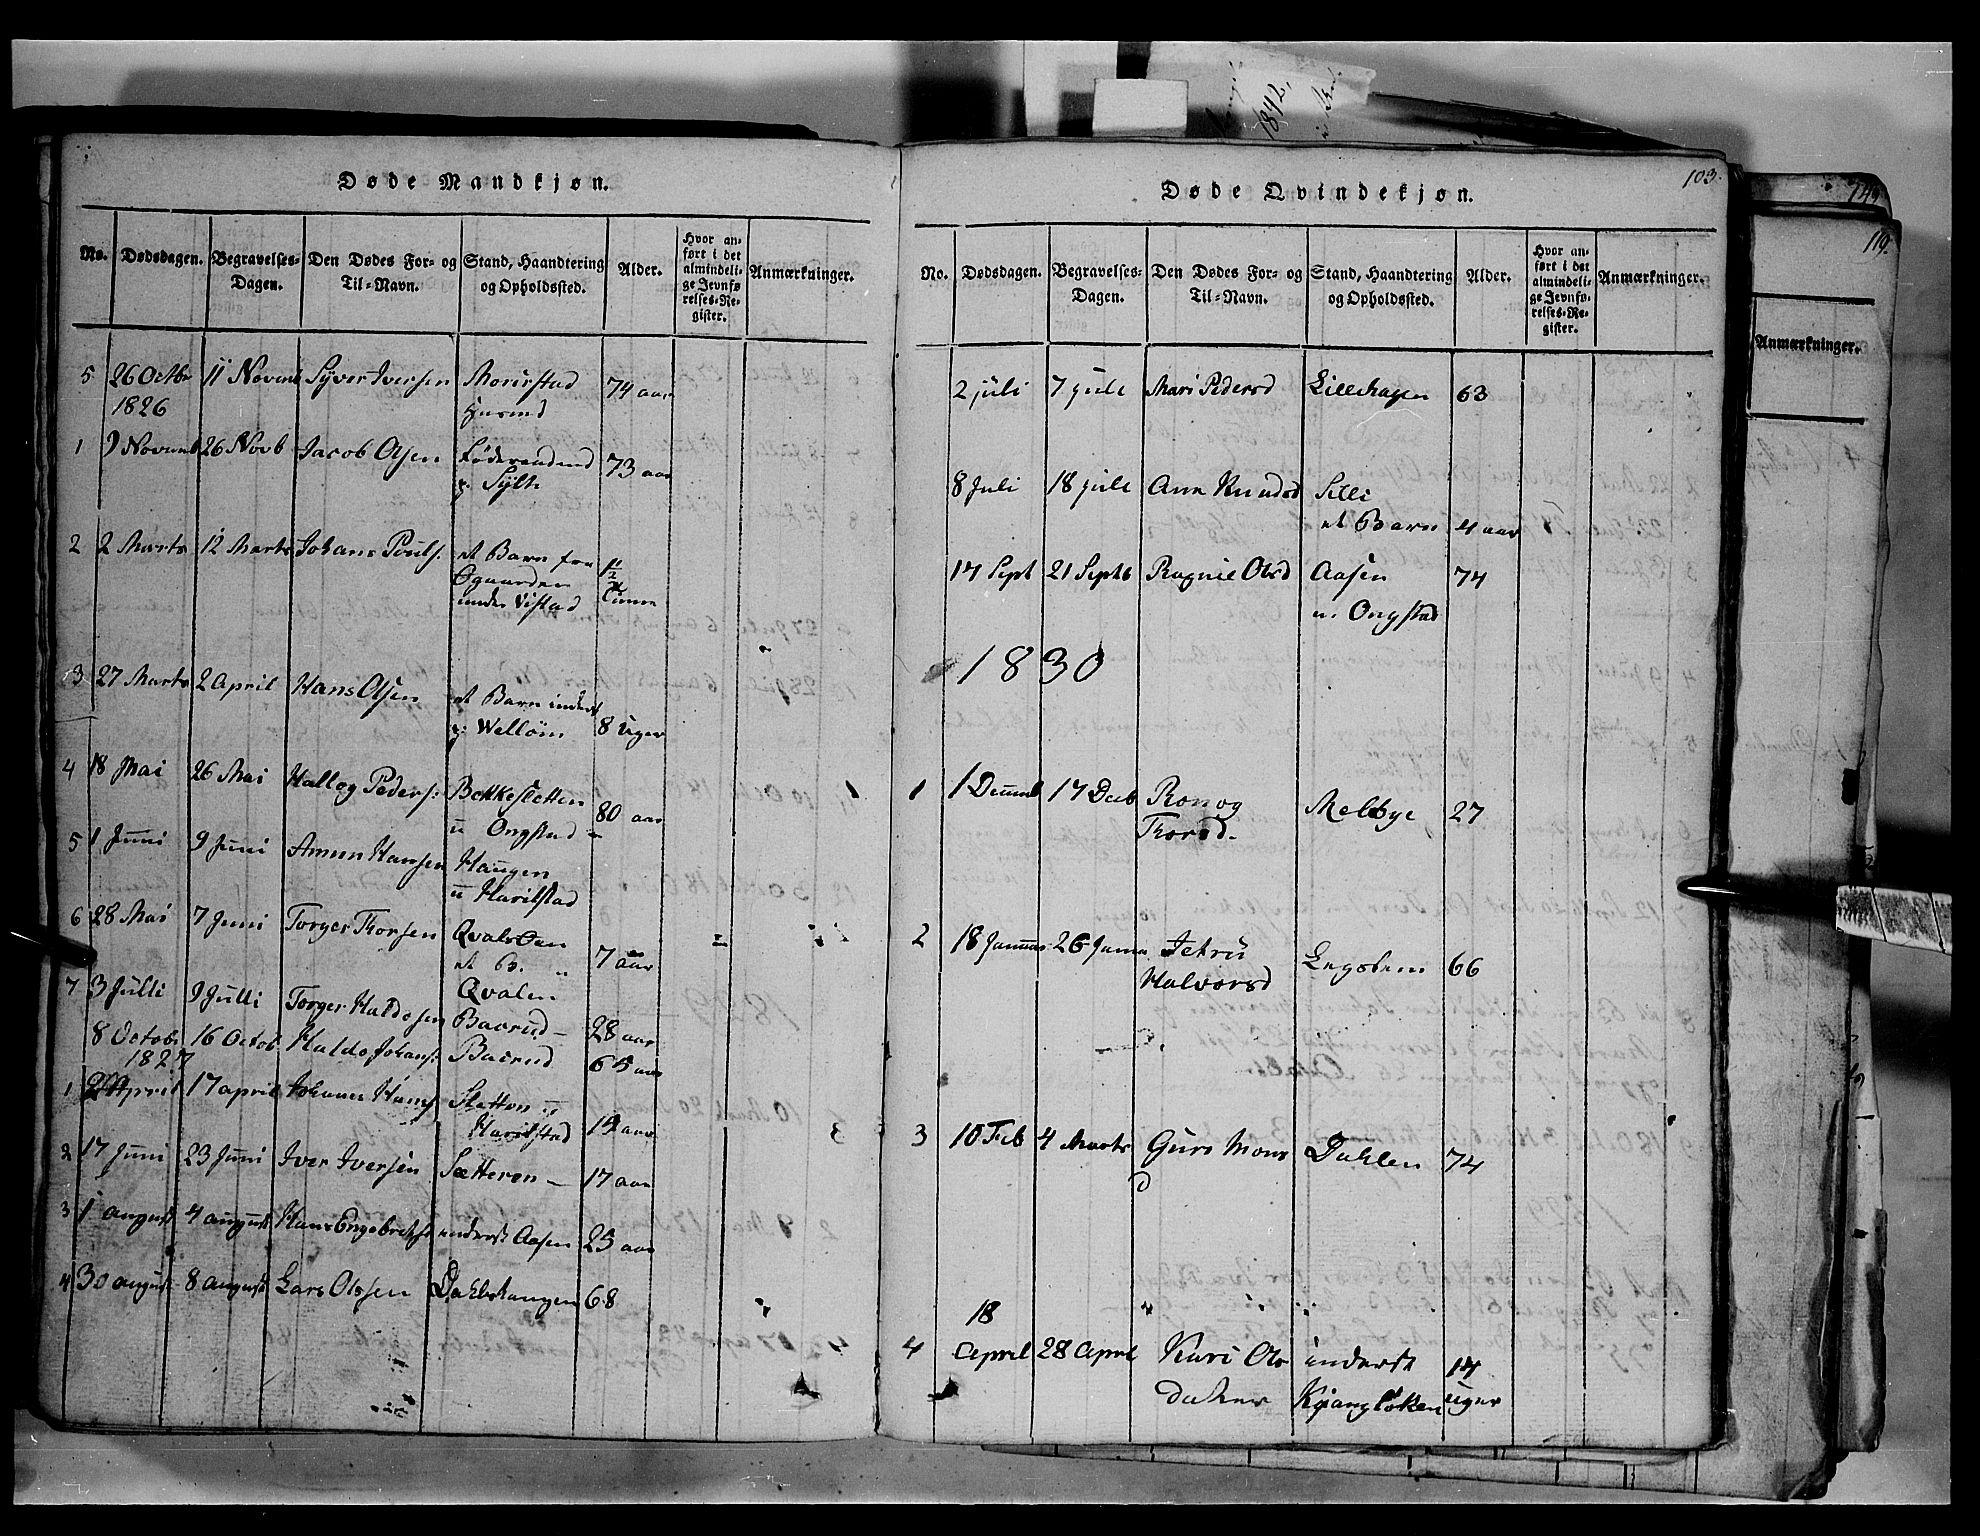 SAH, Fron prestekontor, H/Ha/Hab/L0003: Klokkerbok nr. 3, 1816-1850, s. 103